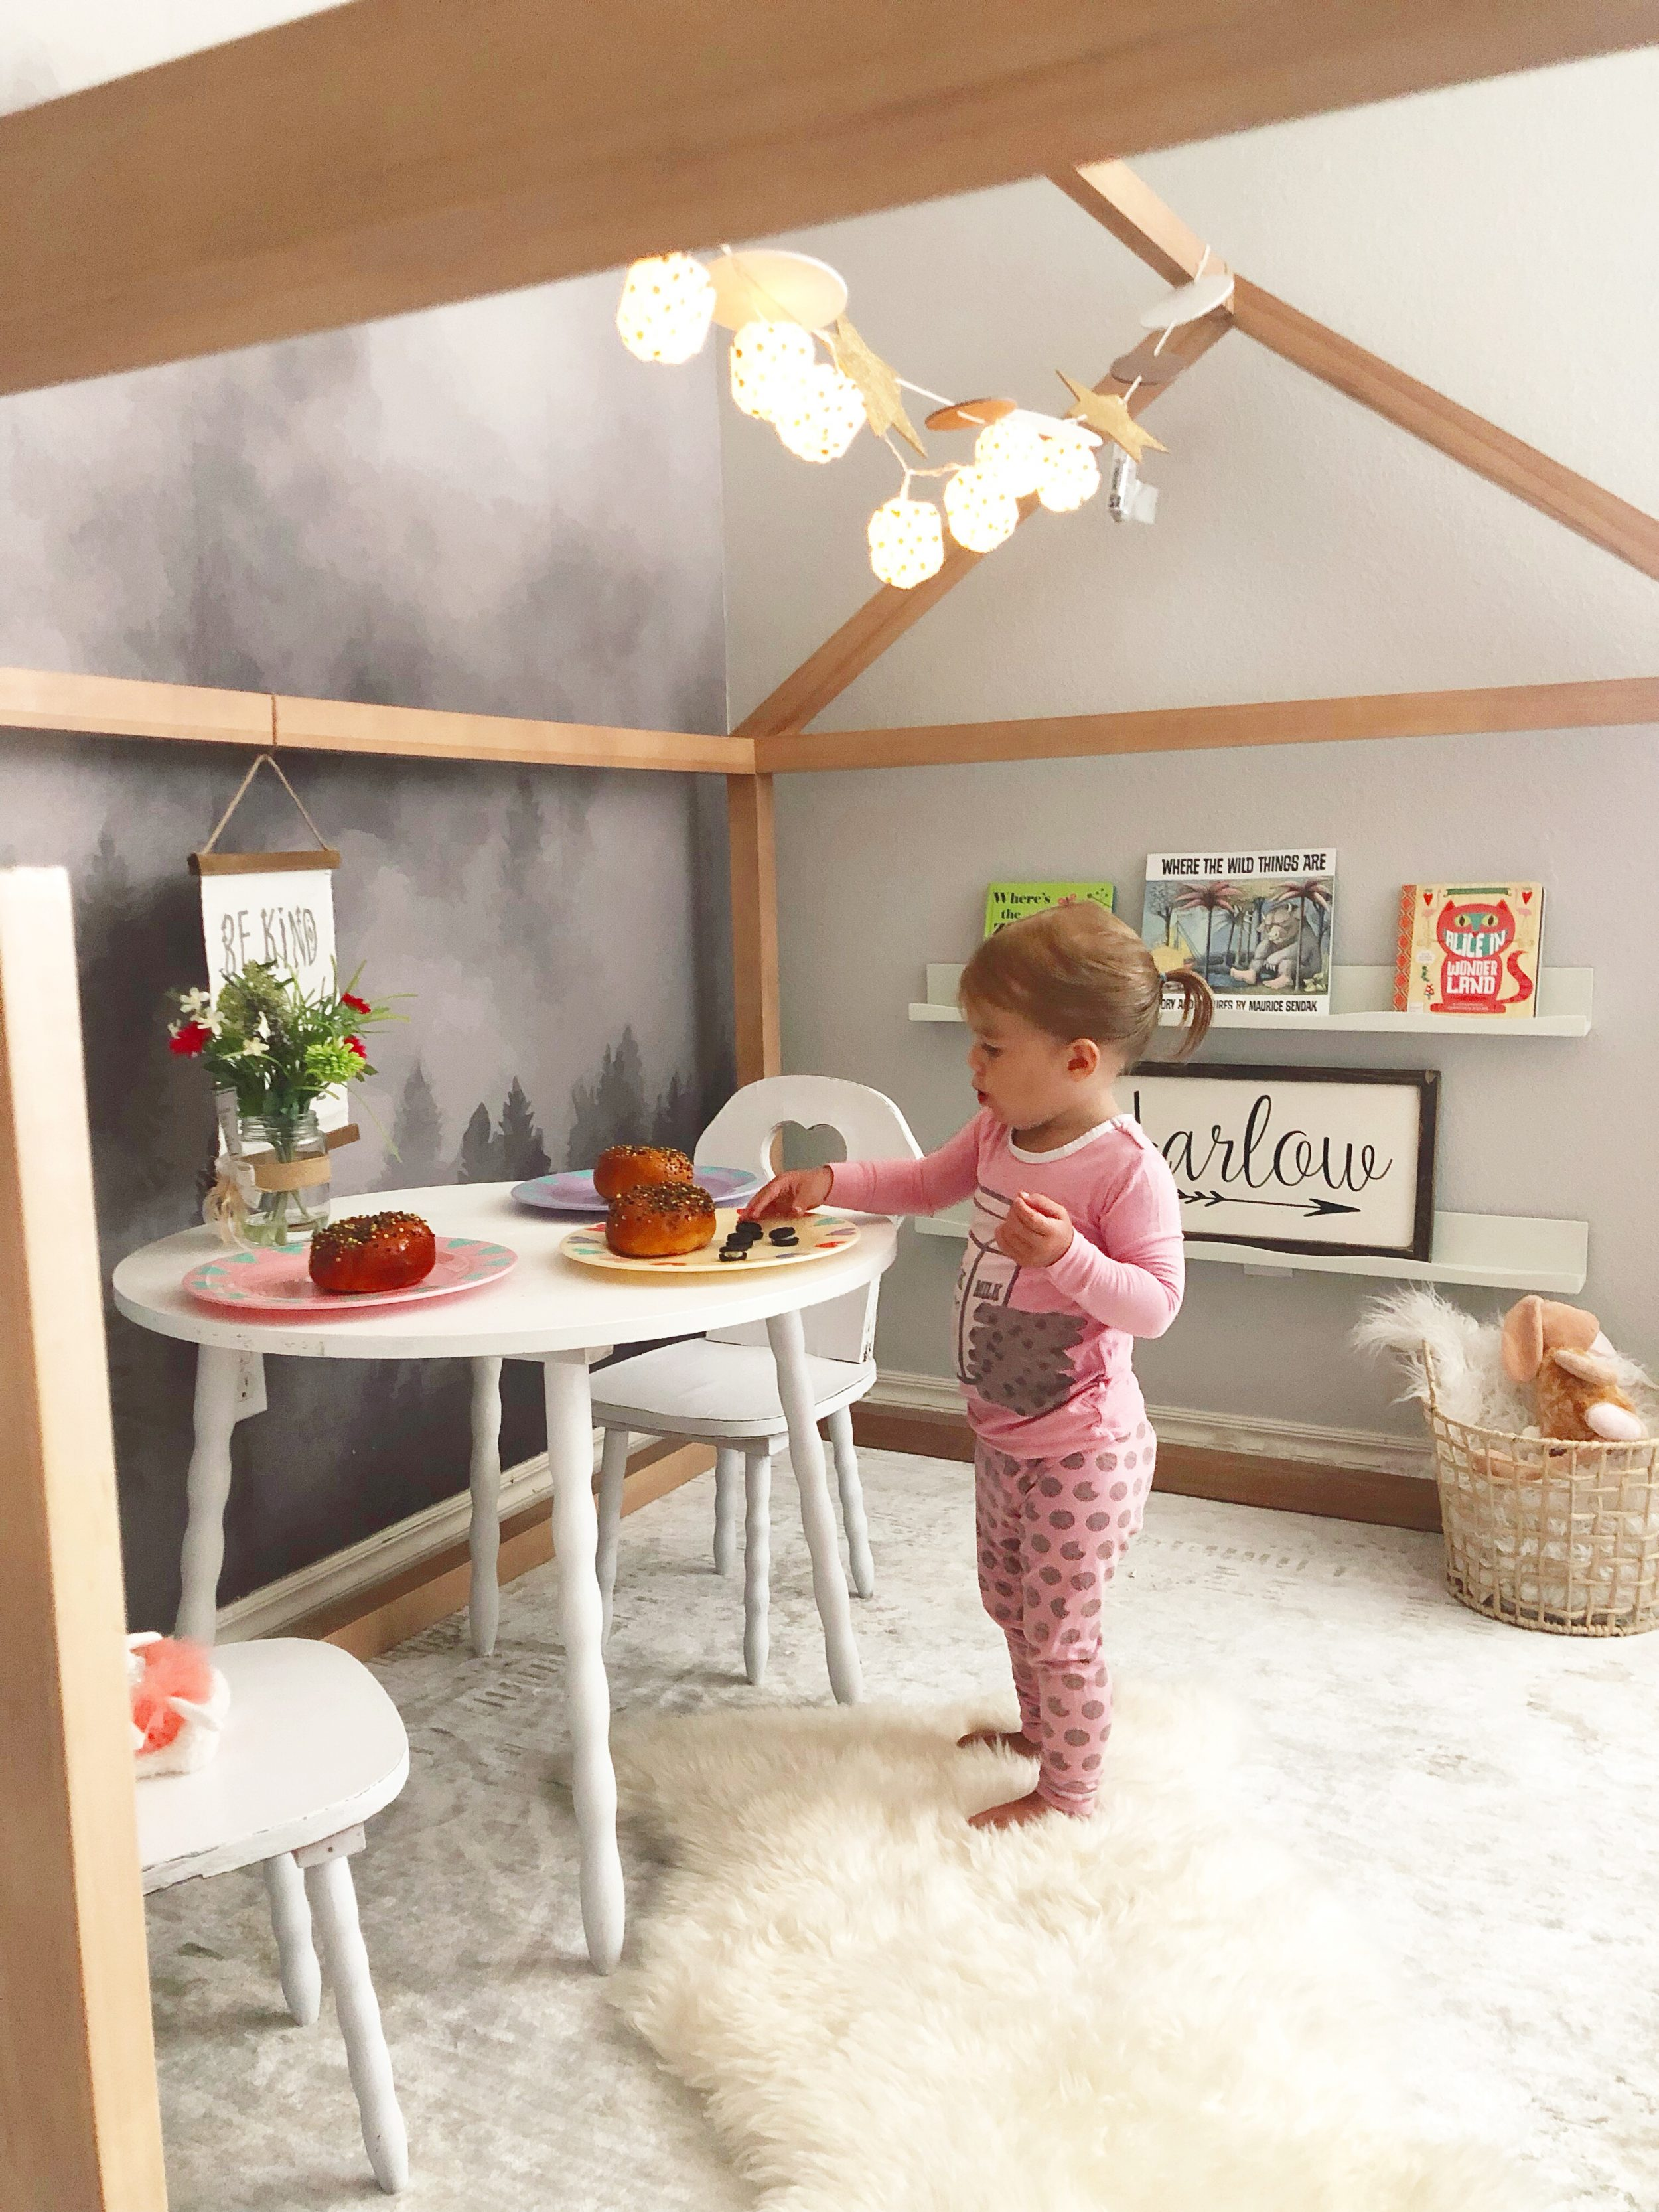 Kid's Playroom Update with Drew Barrymore's Flower Kids